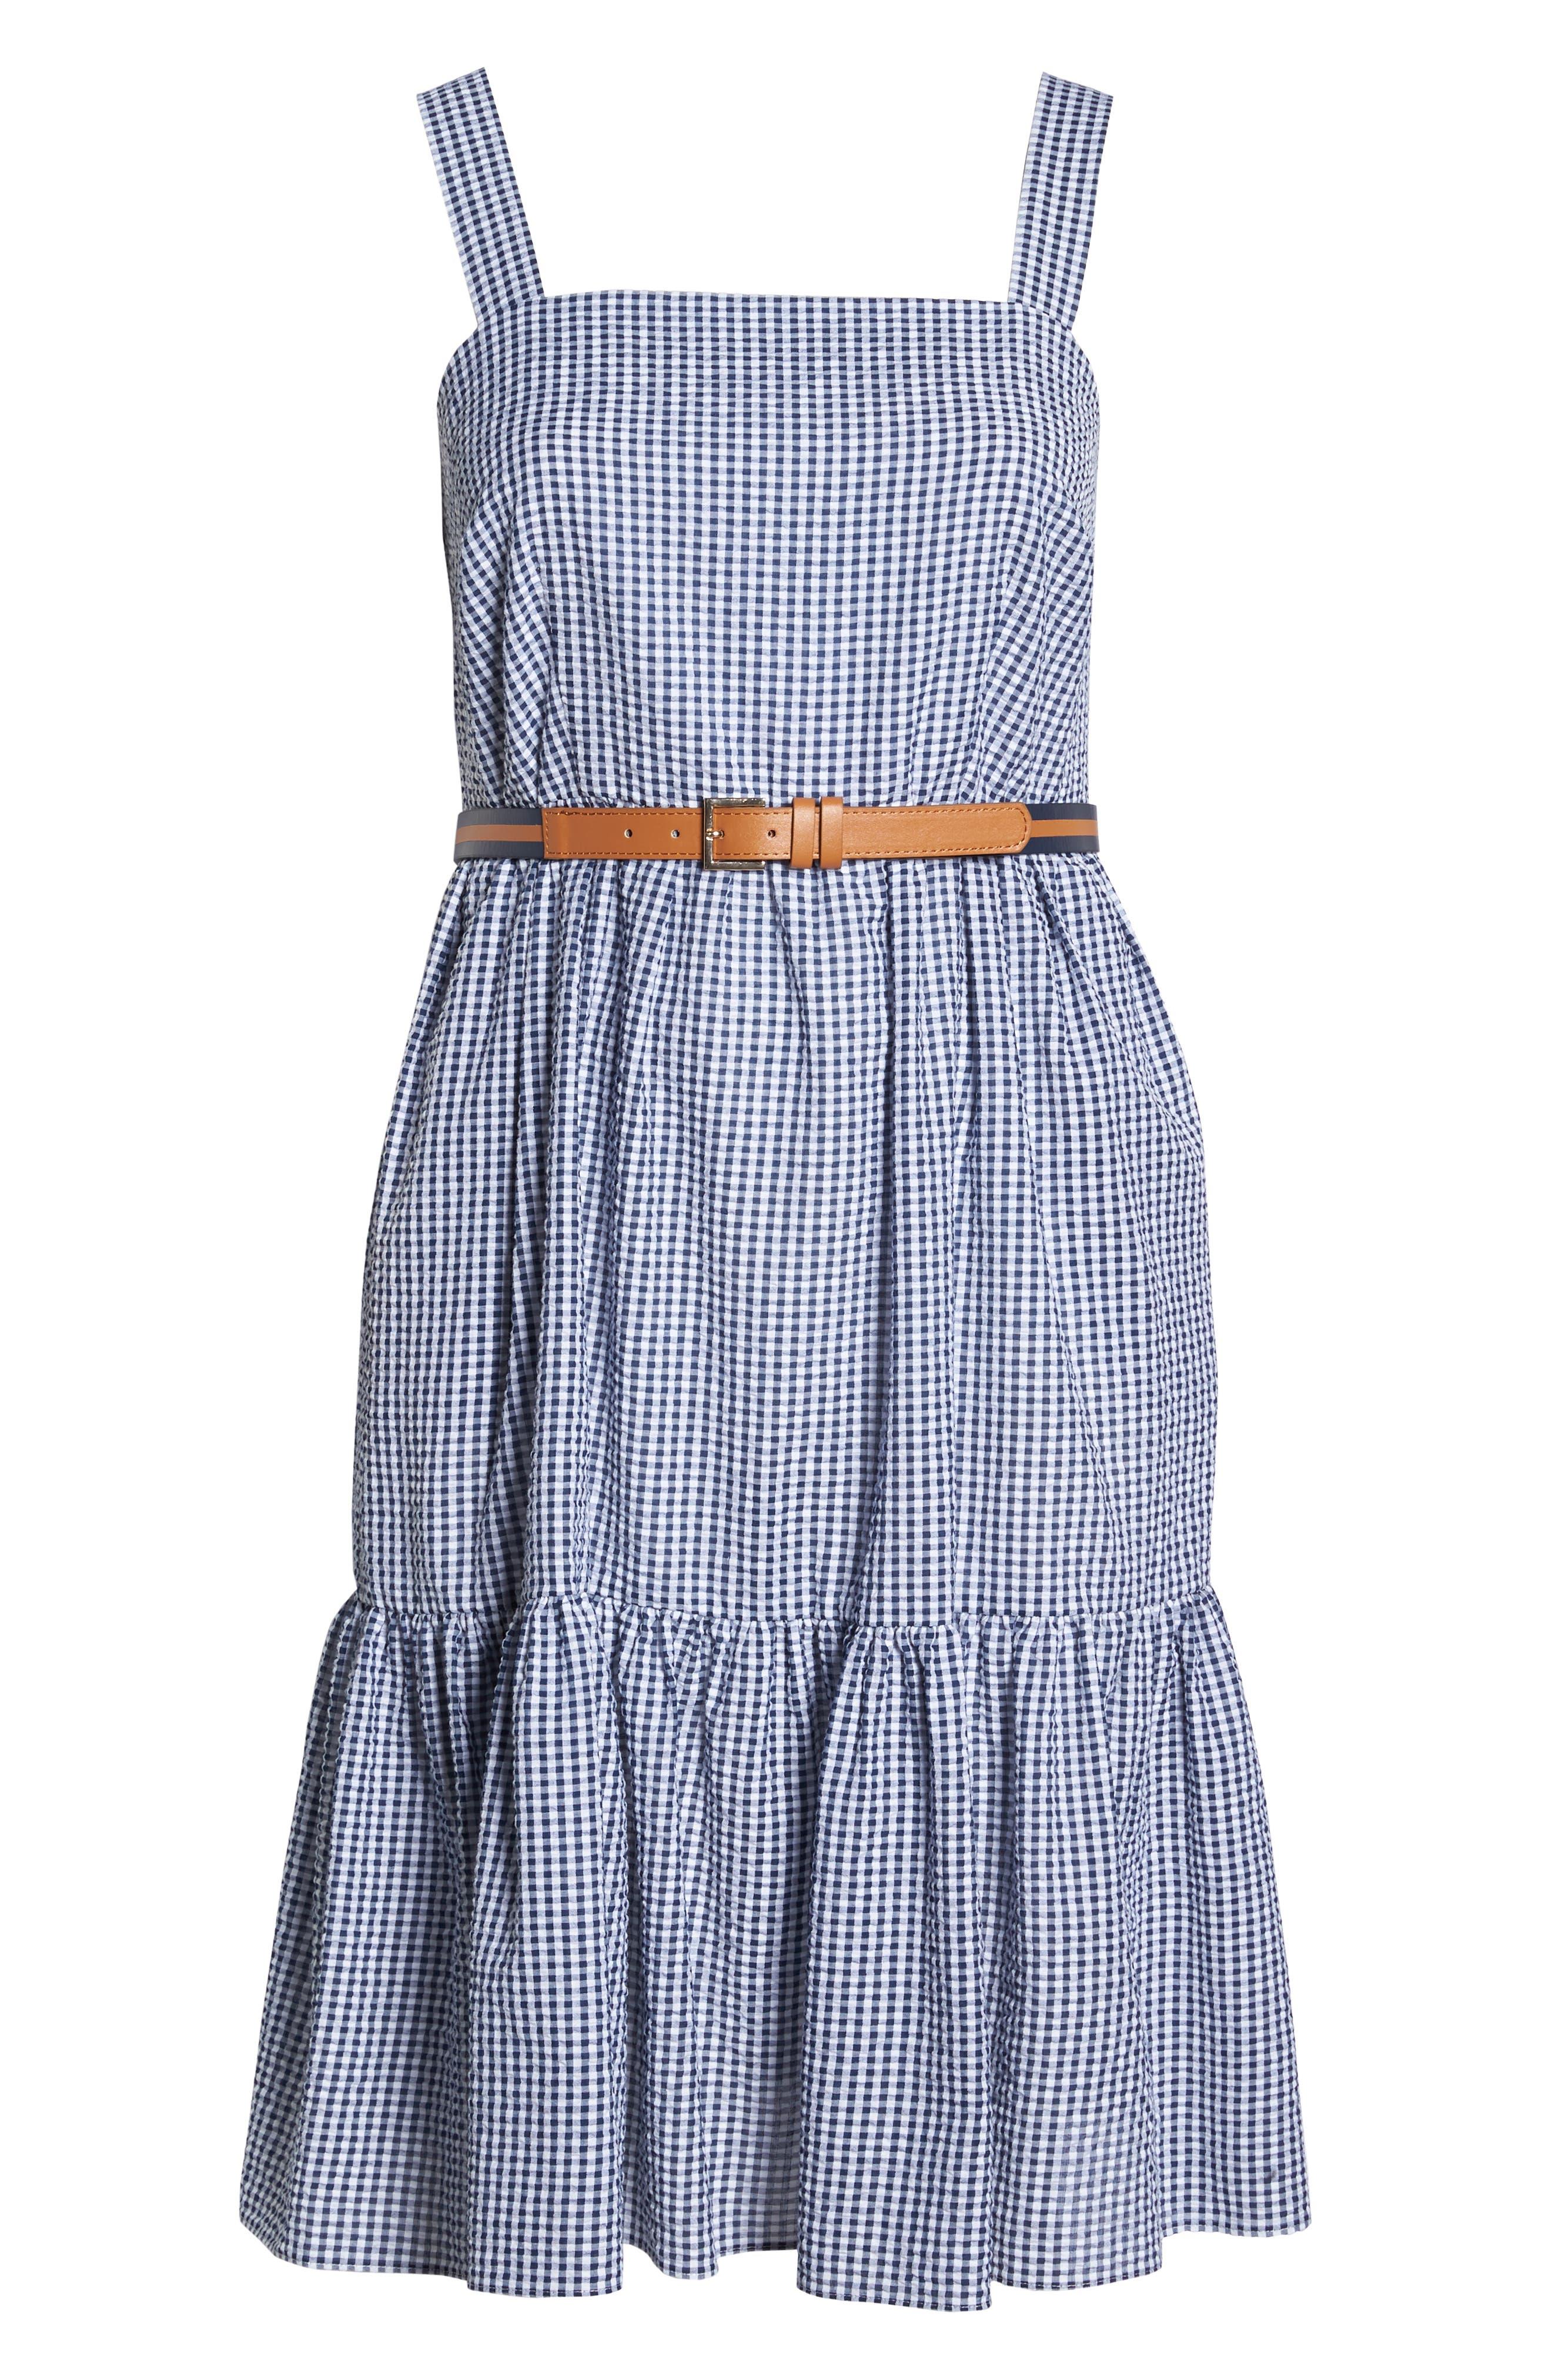 Belted Gingham Seersucker Fit & Flare Dress,                             Alternate thumbnail 7, color,                             Navy/ Ivory